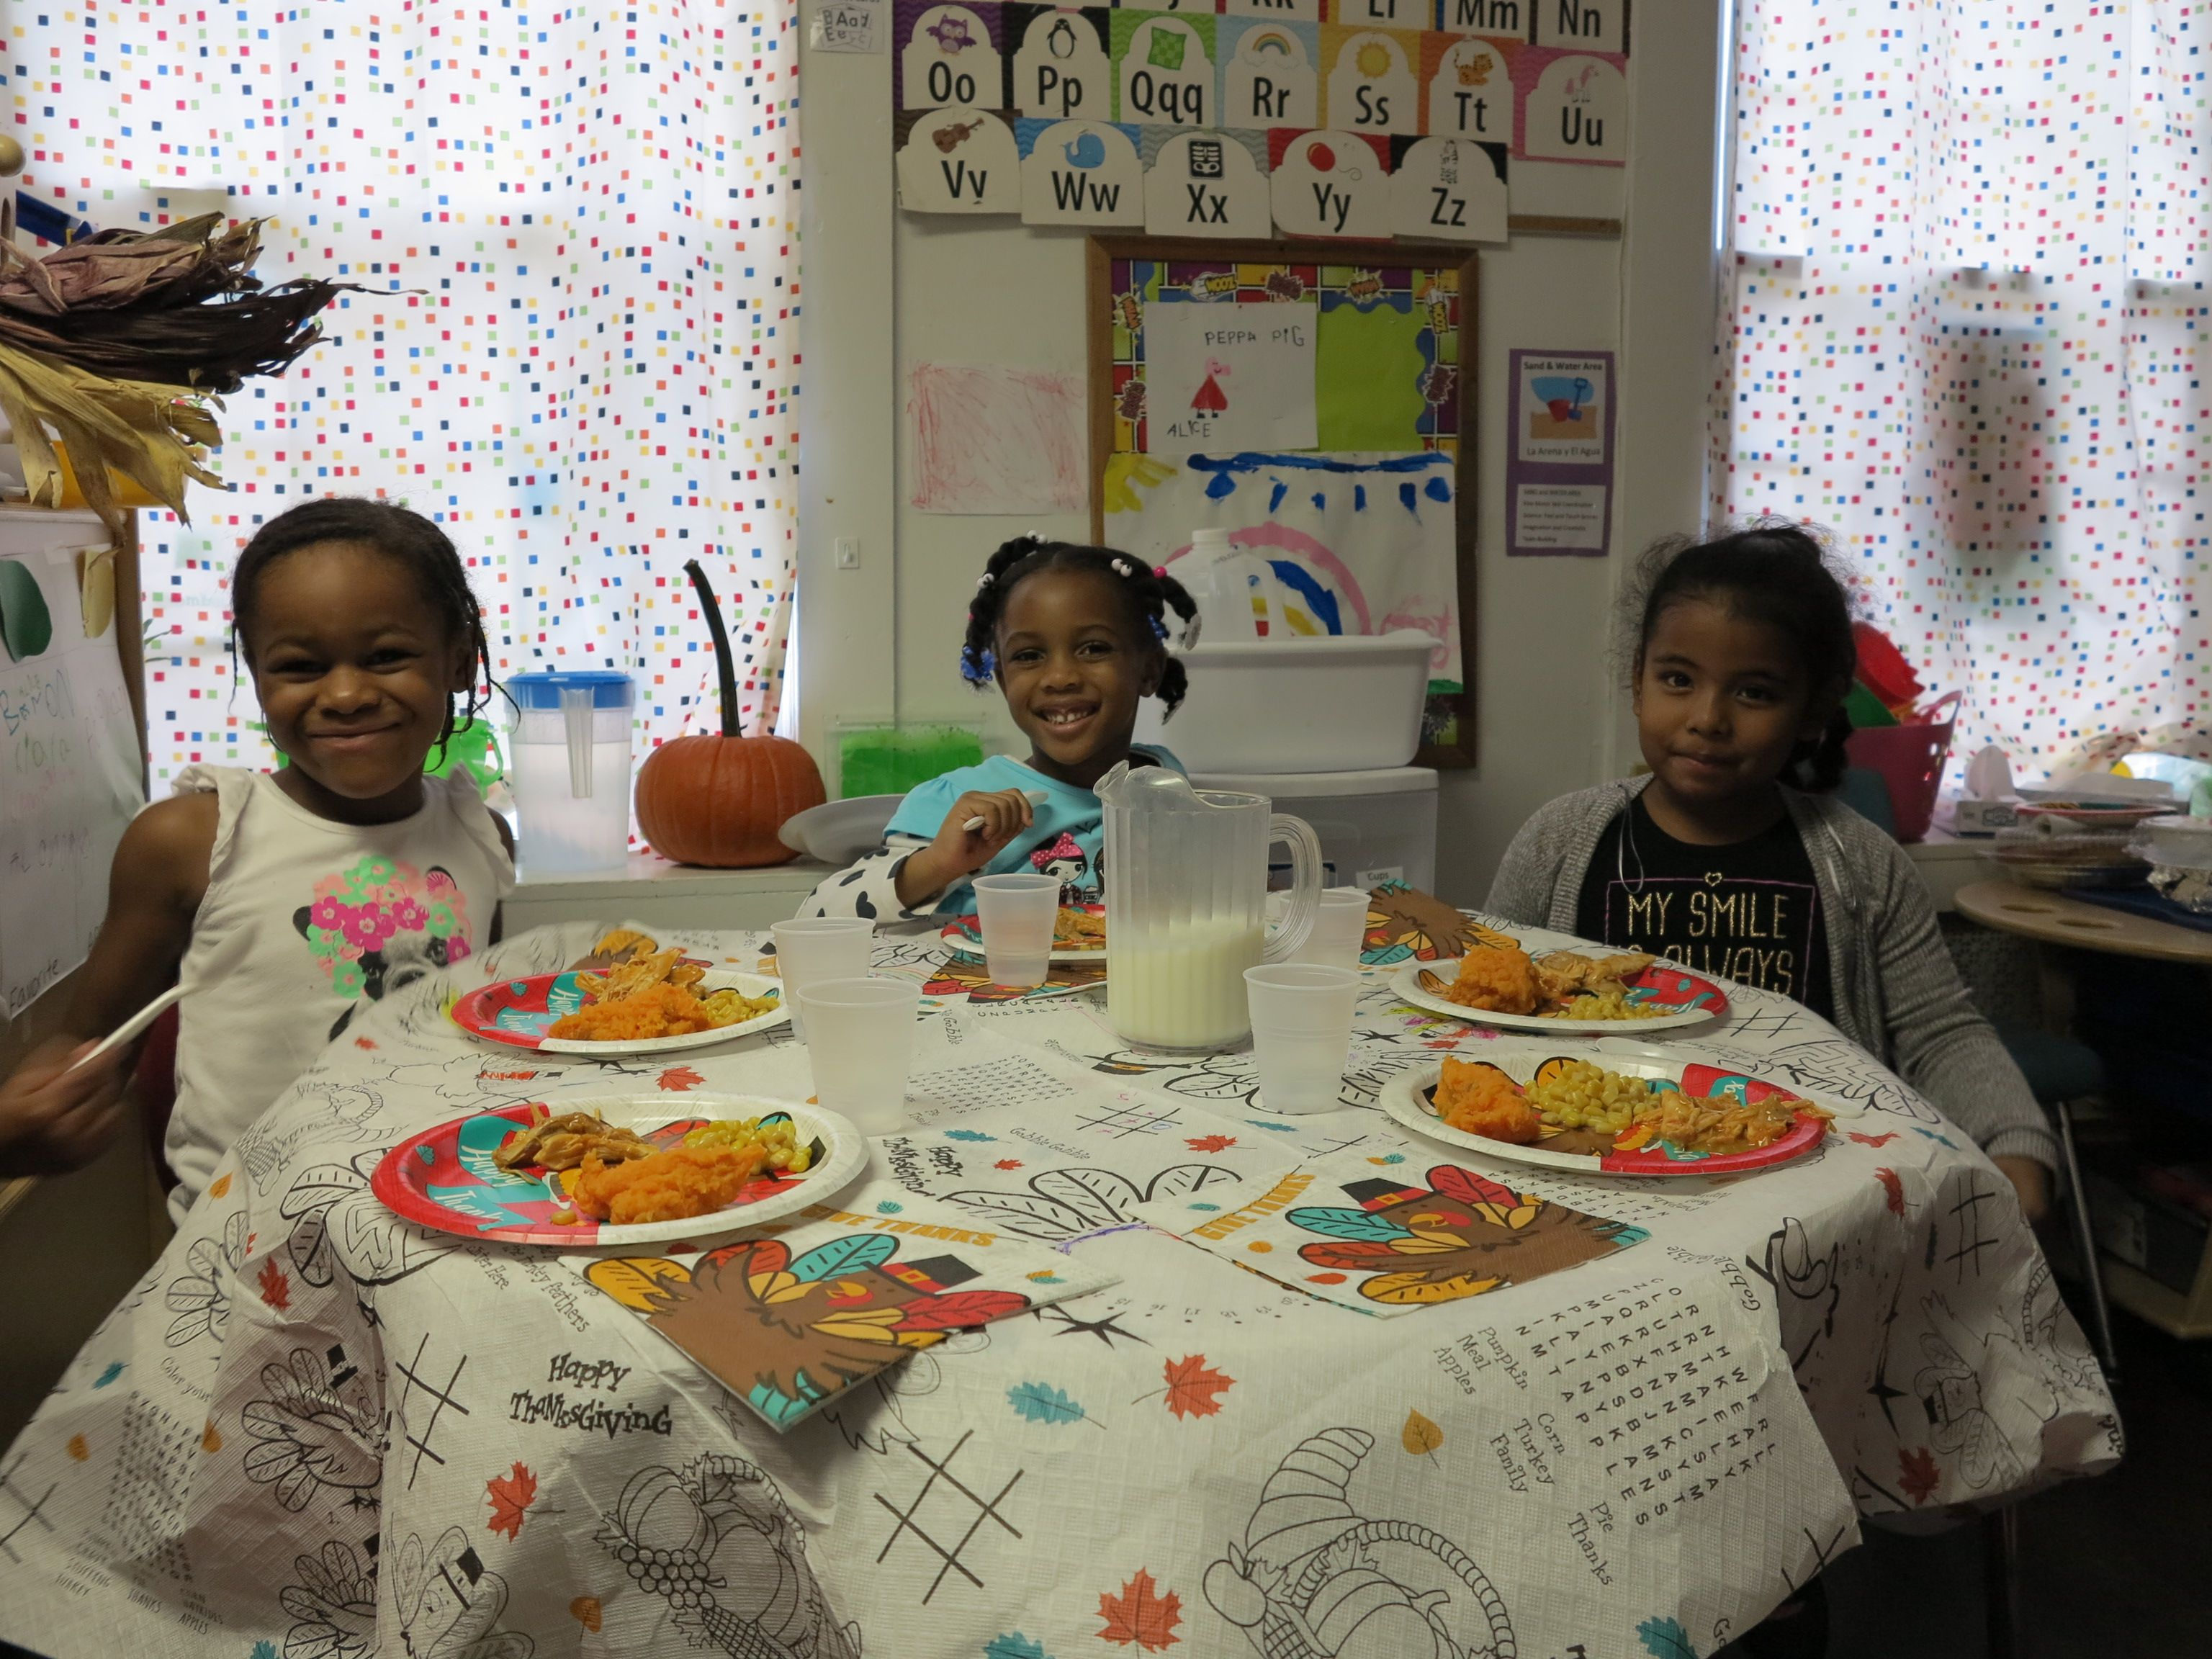 Friends enjoying Thanksgiving